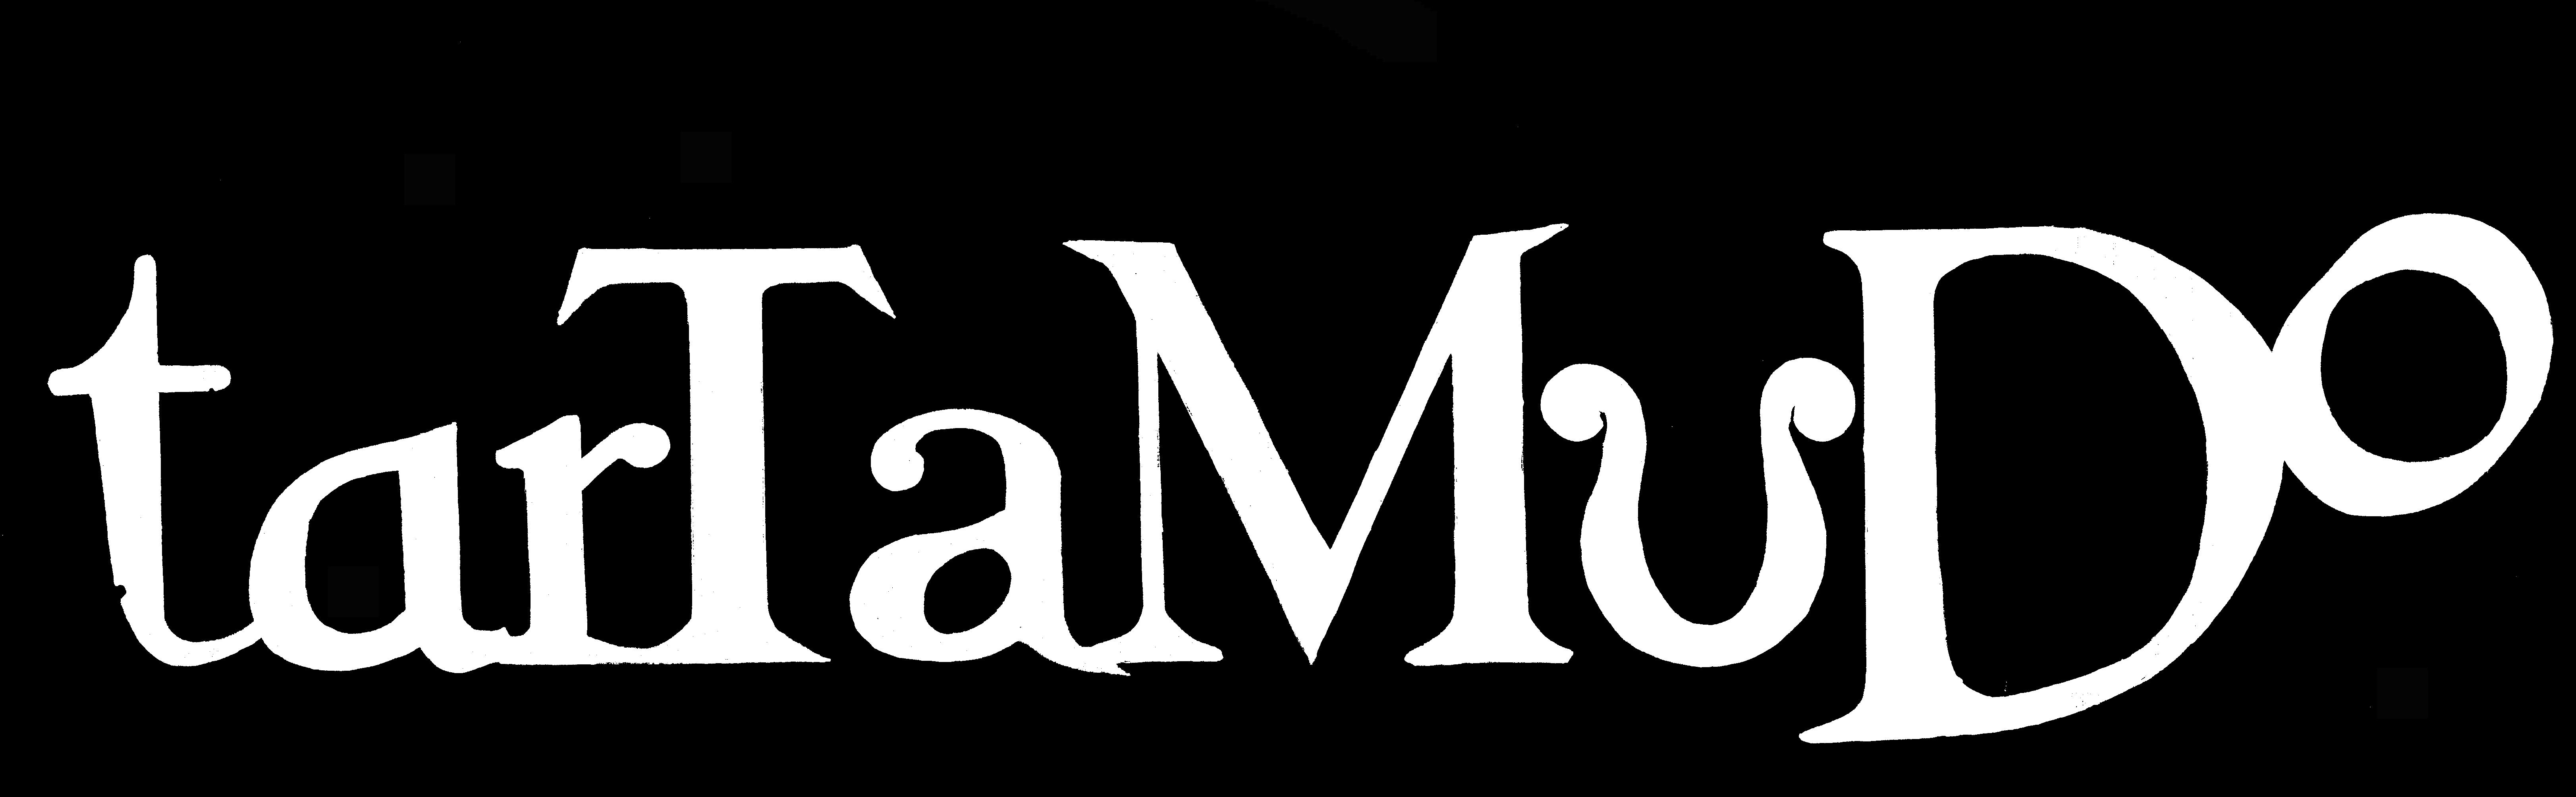 Logo Tartamudo utilisé 2 long fond noir